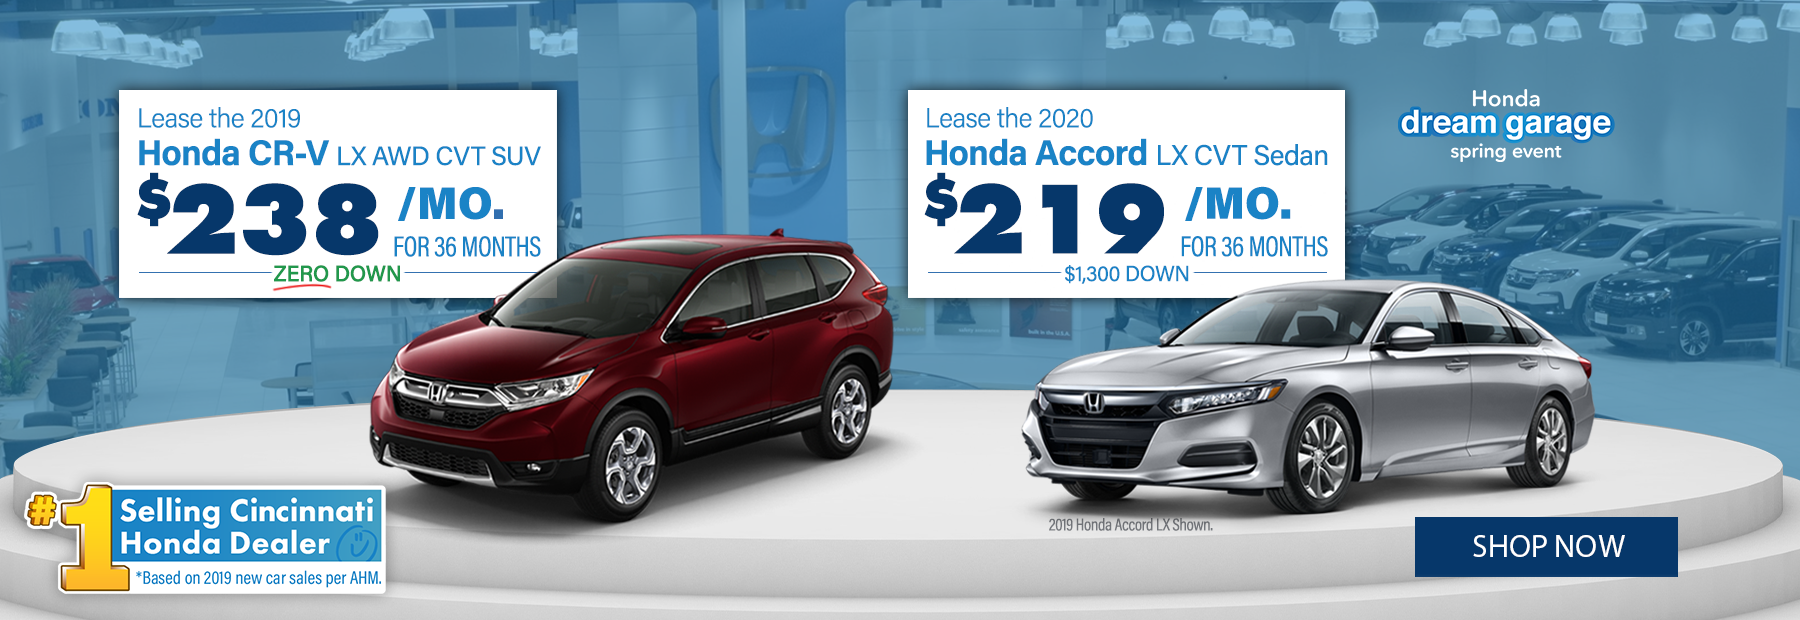 New Honda CR-V and Honda Accord Lease Dealer in Cincinnati, OH